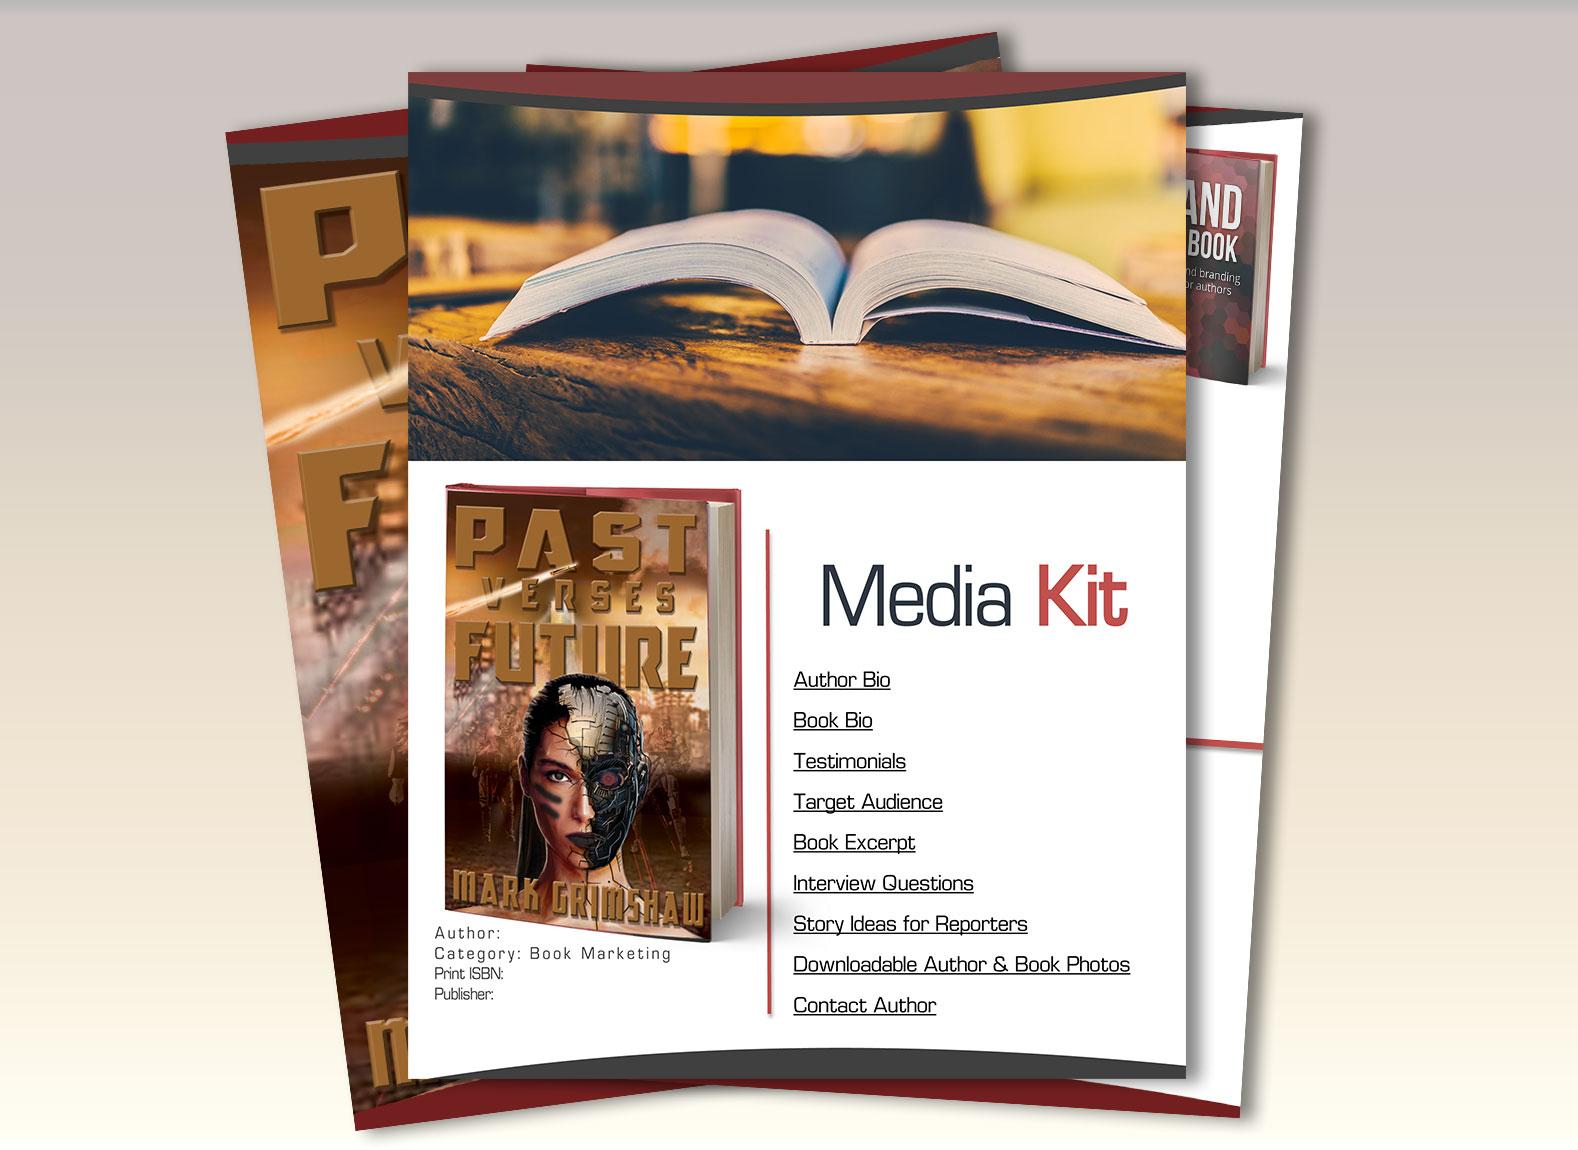 Book Branders mediakitimg Marketing